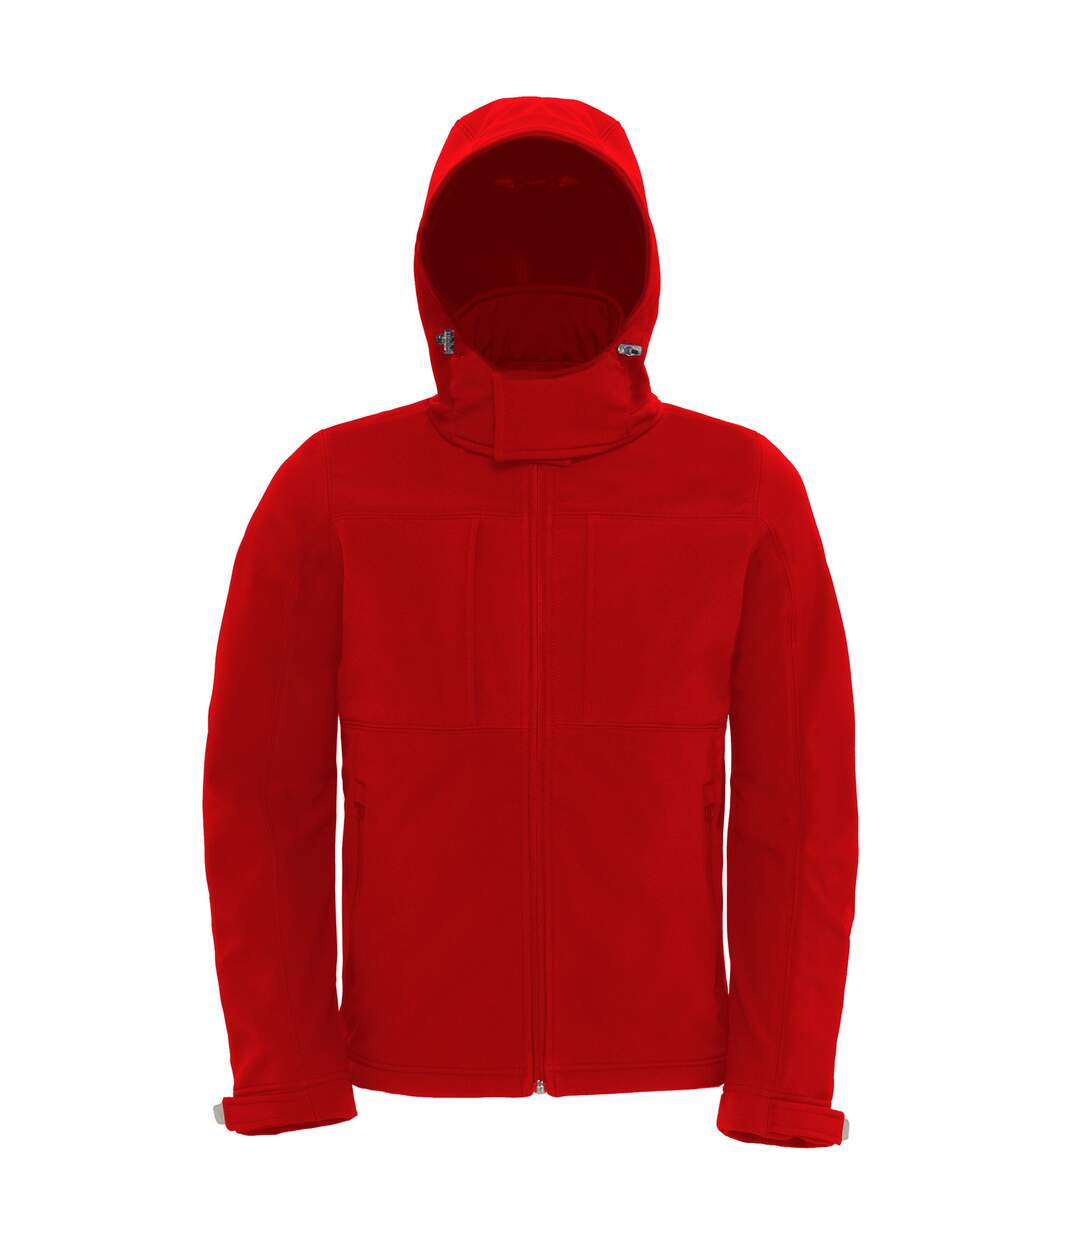 B&C Mens Hooded Softshell Breathable, Waterproof & Windproof Jacket (Fleece Lining) (Red) - UTBC2001